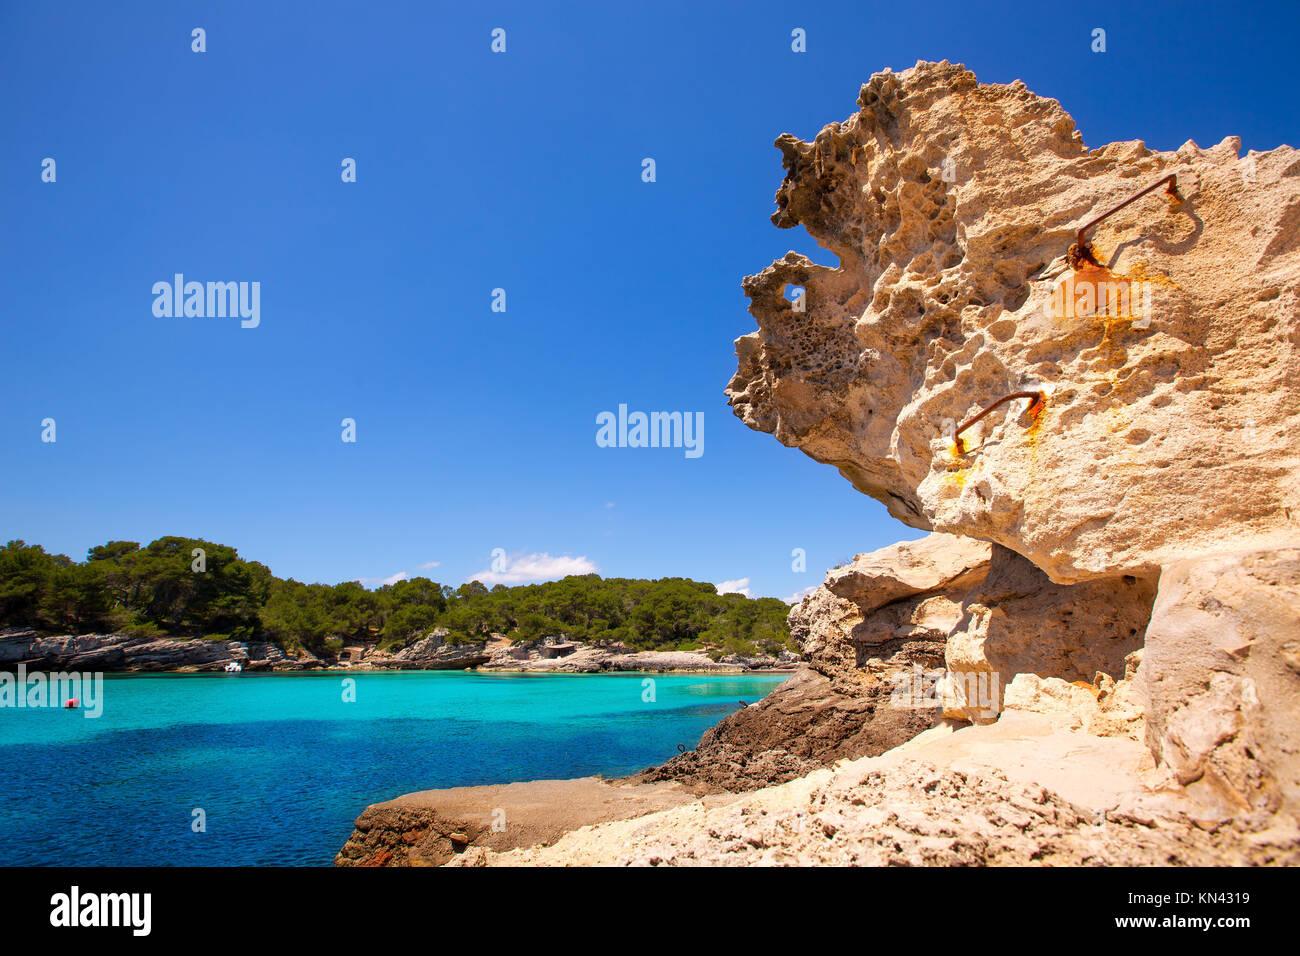 Menorca Cala en Turqueta Ciutadella turquoise Mediterranean at Balearic islands. - Stock Image